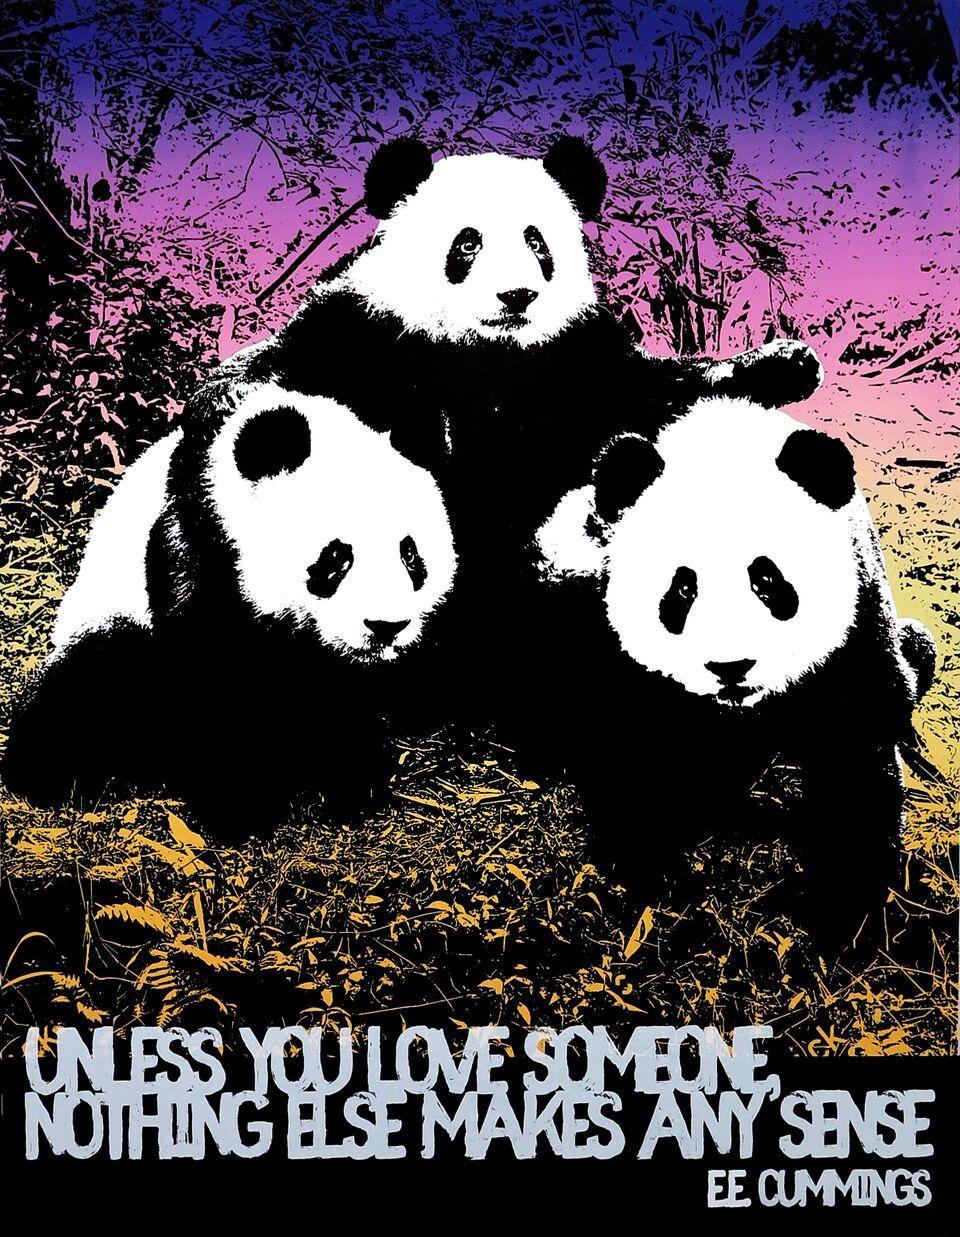 Motivational Panda (E.E. Cummings)